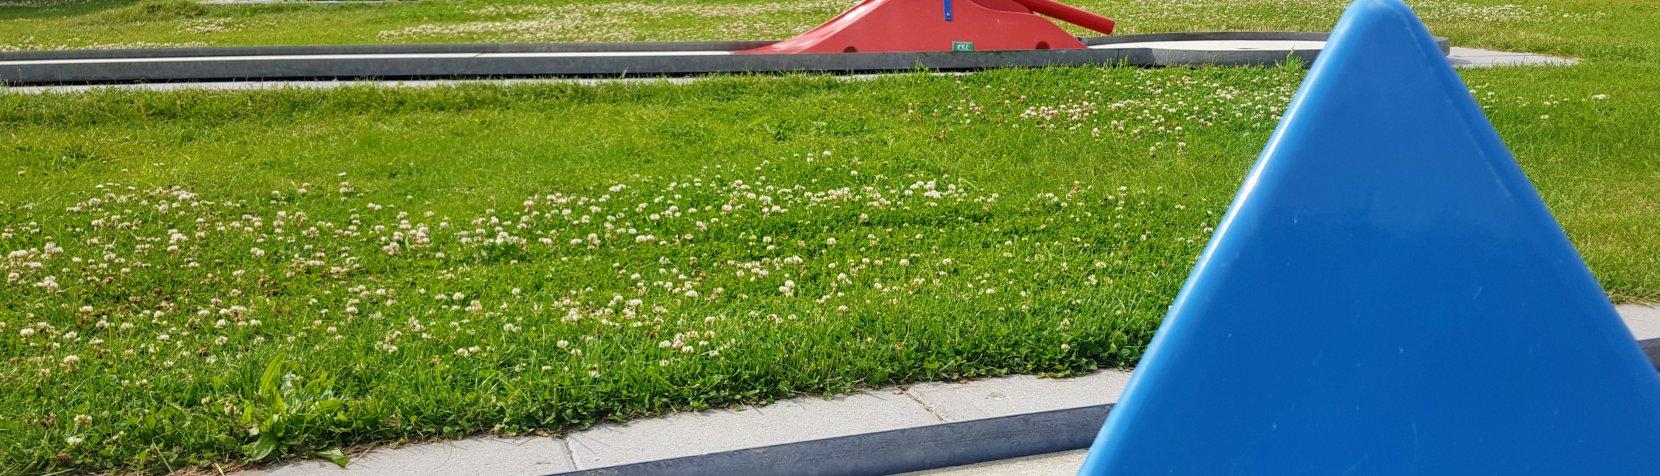 Rudersdal Minigolfbane - Holtegårdsparken